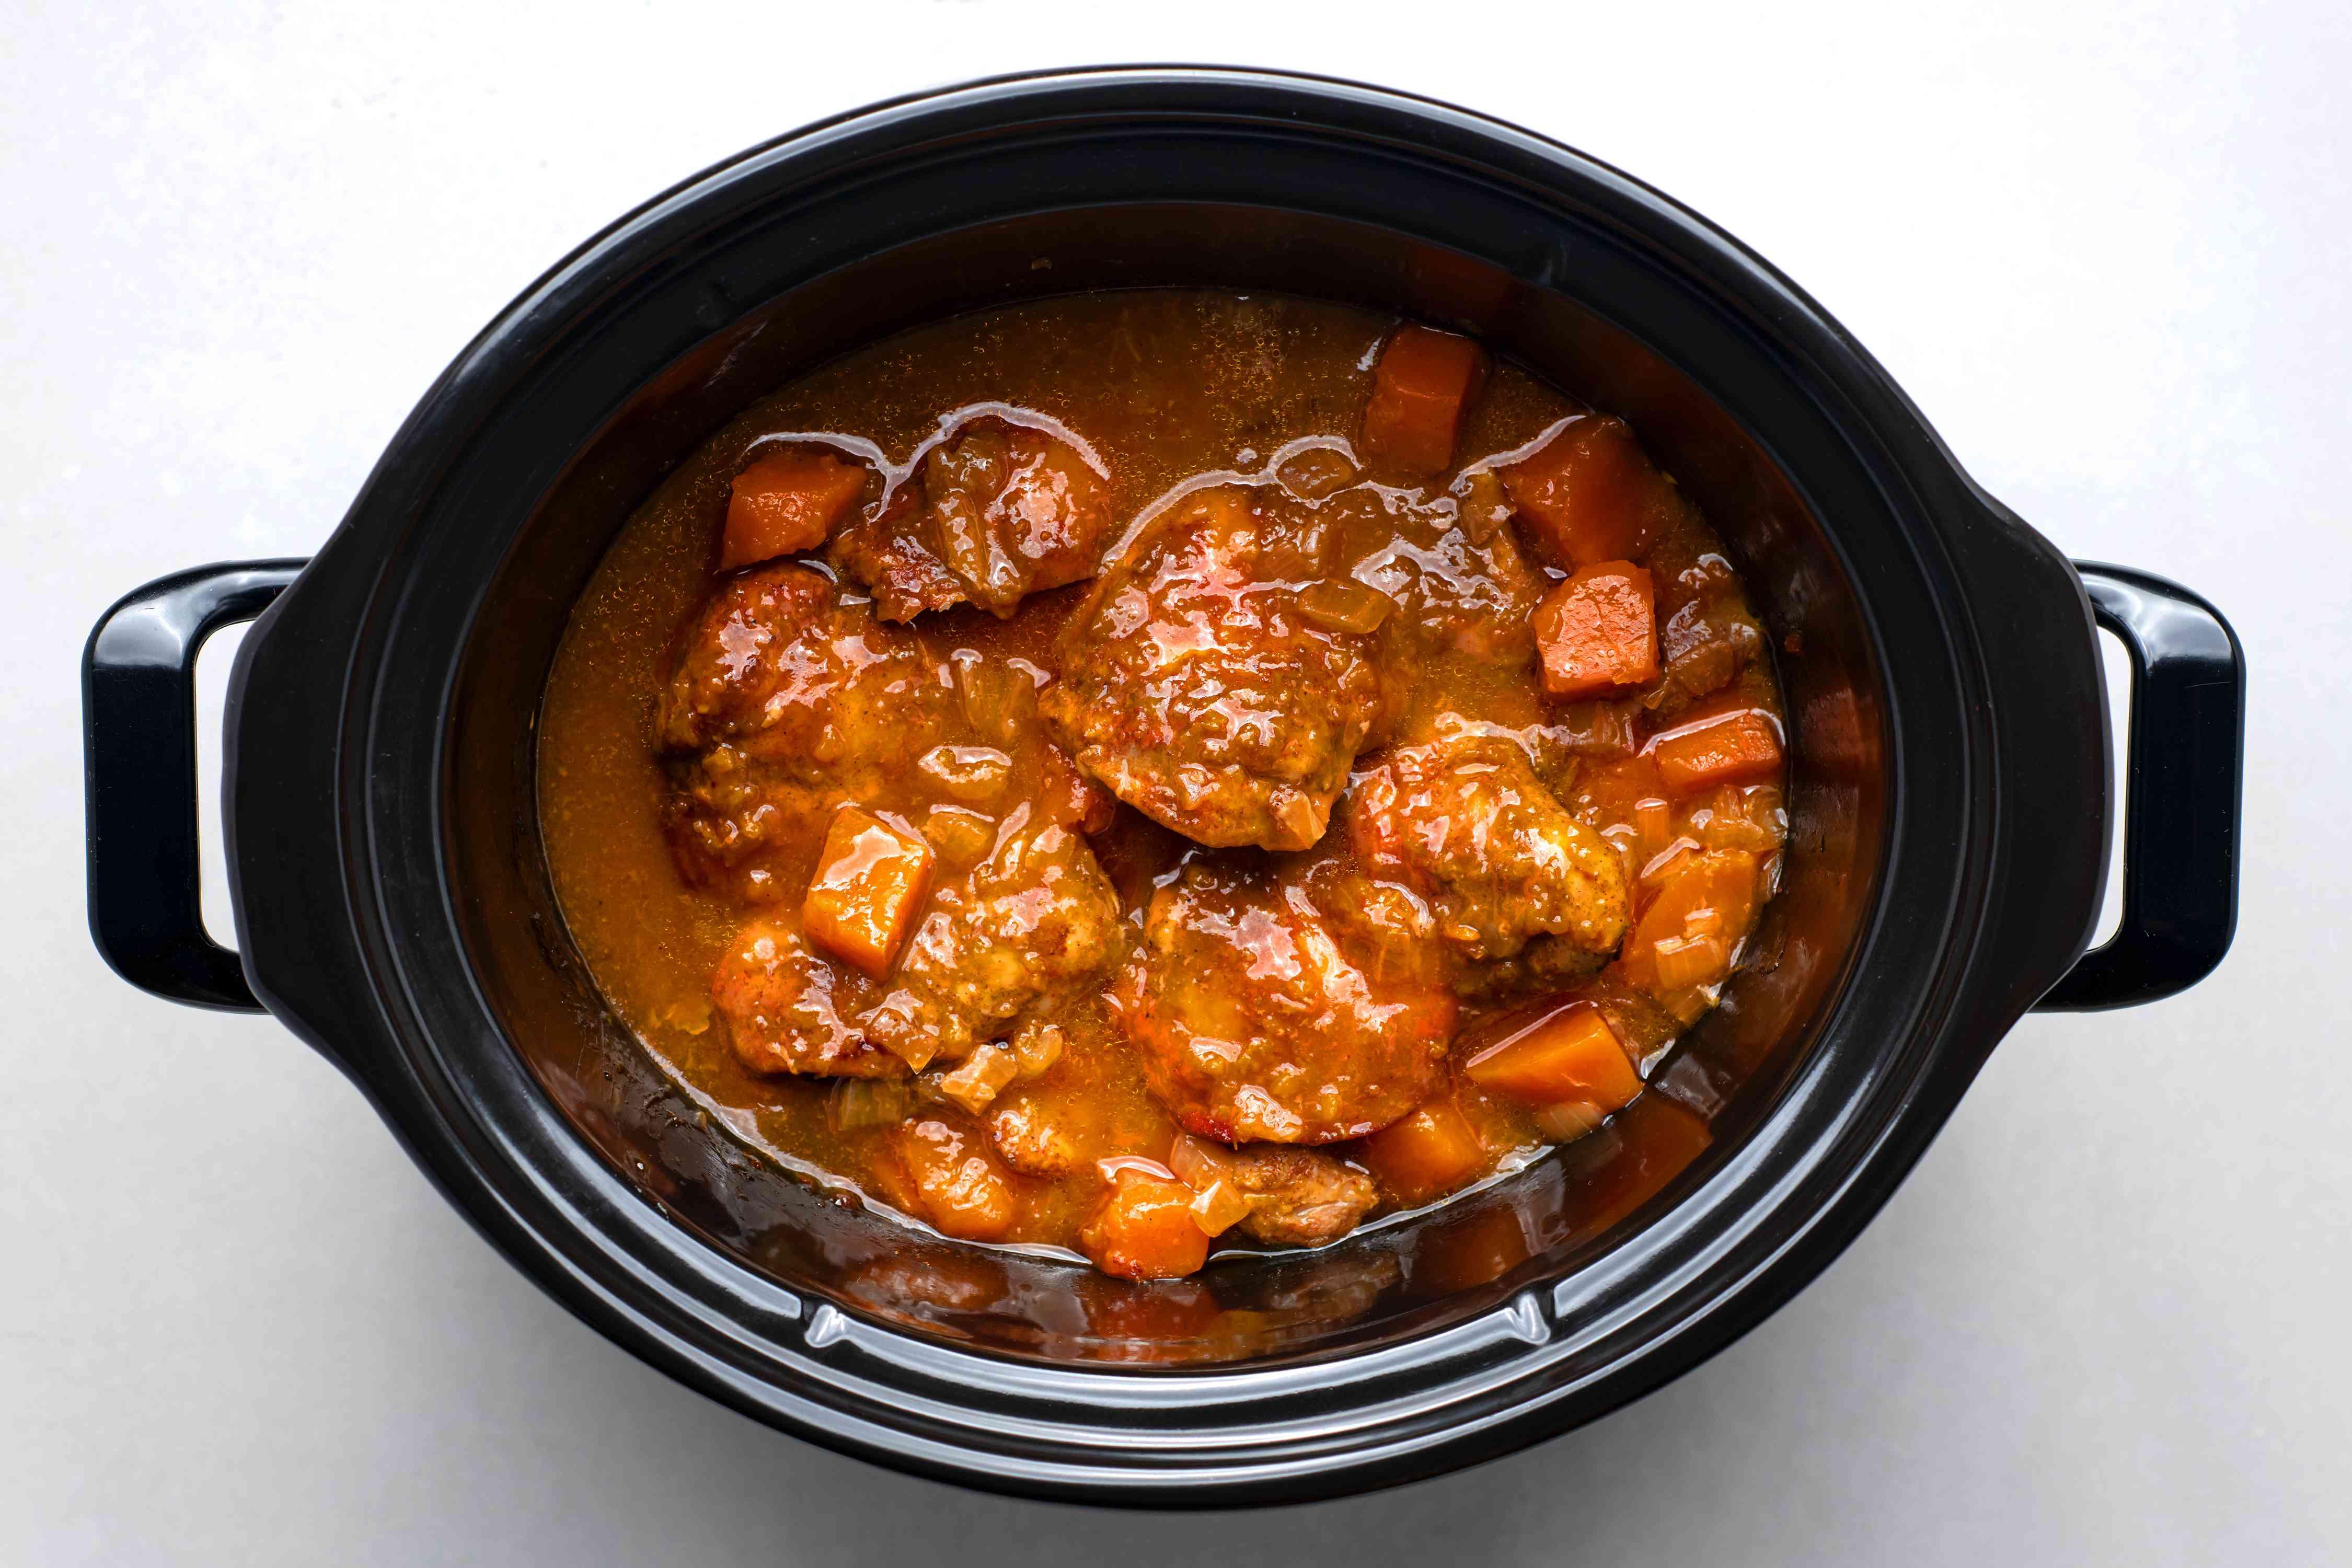 Crockpot Chicken and Sweet Potatoes